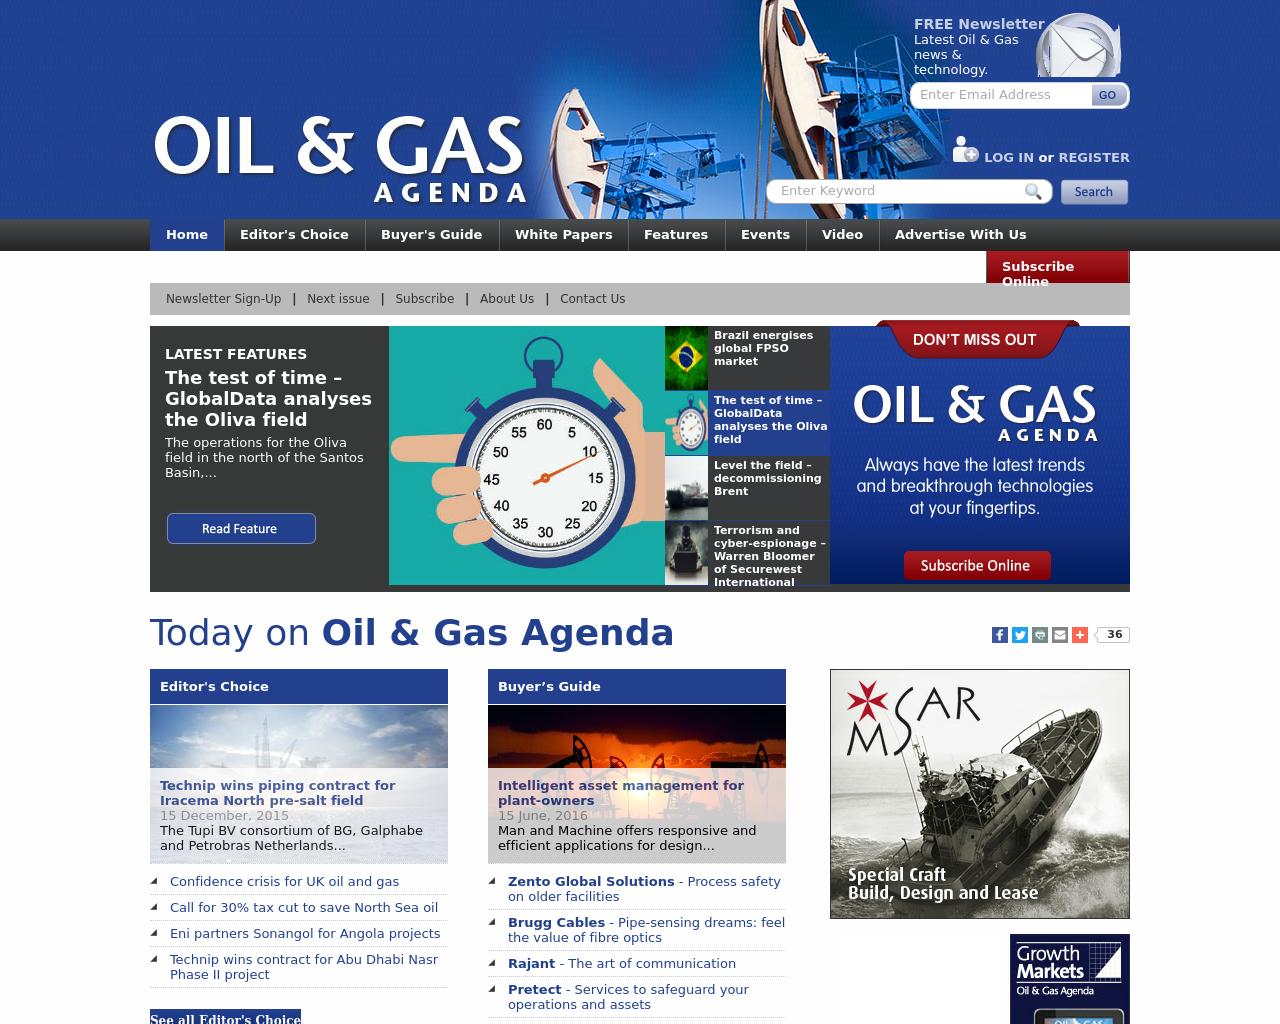 Oil-&-Gas-Agenda-Advertising-Reviews-Pricing